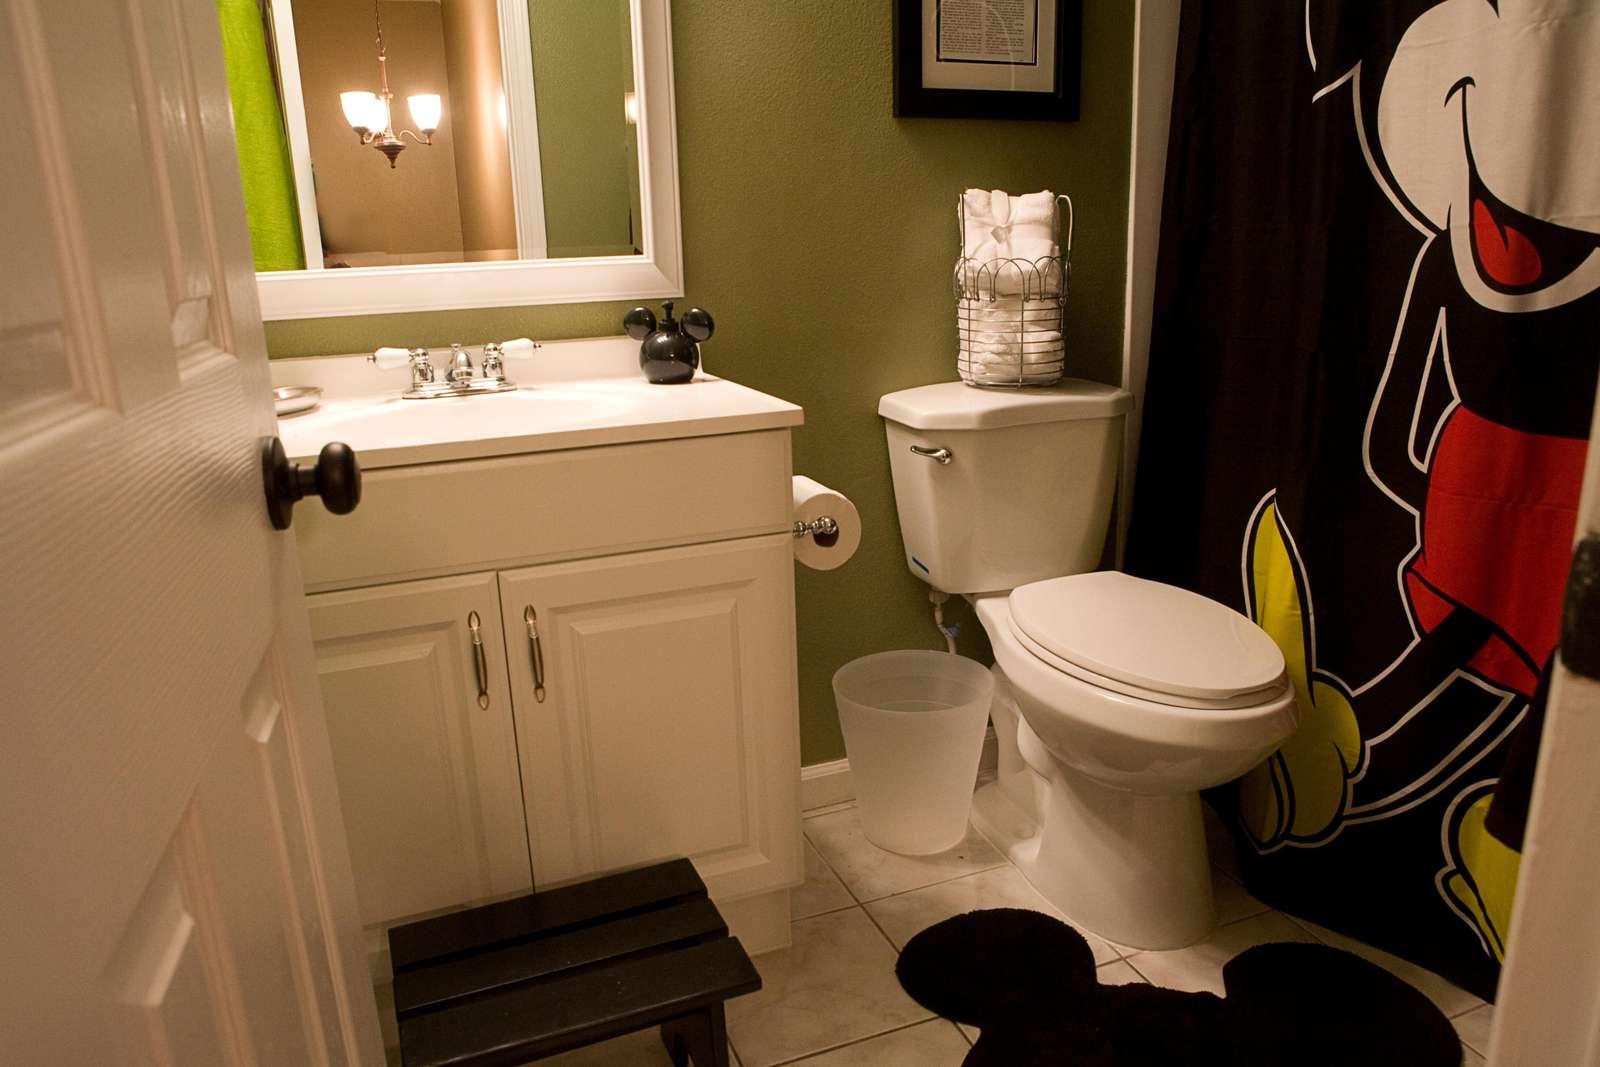 The Disney Bathroom